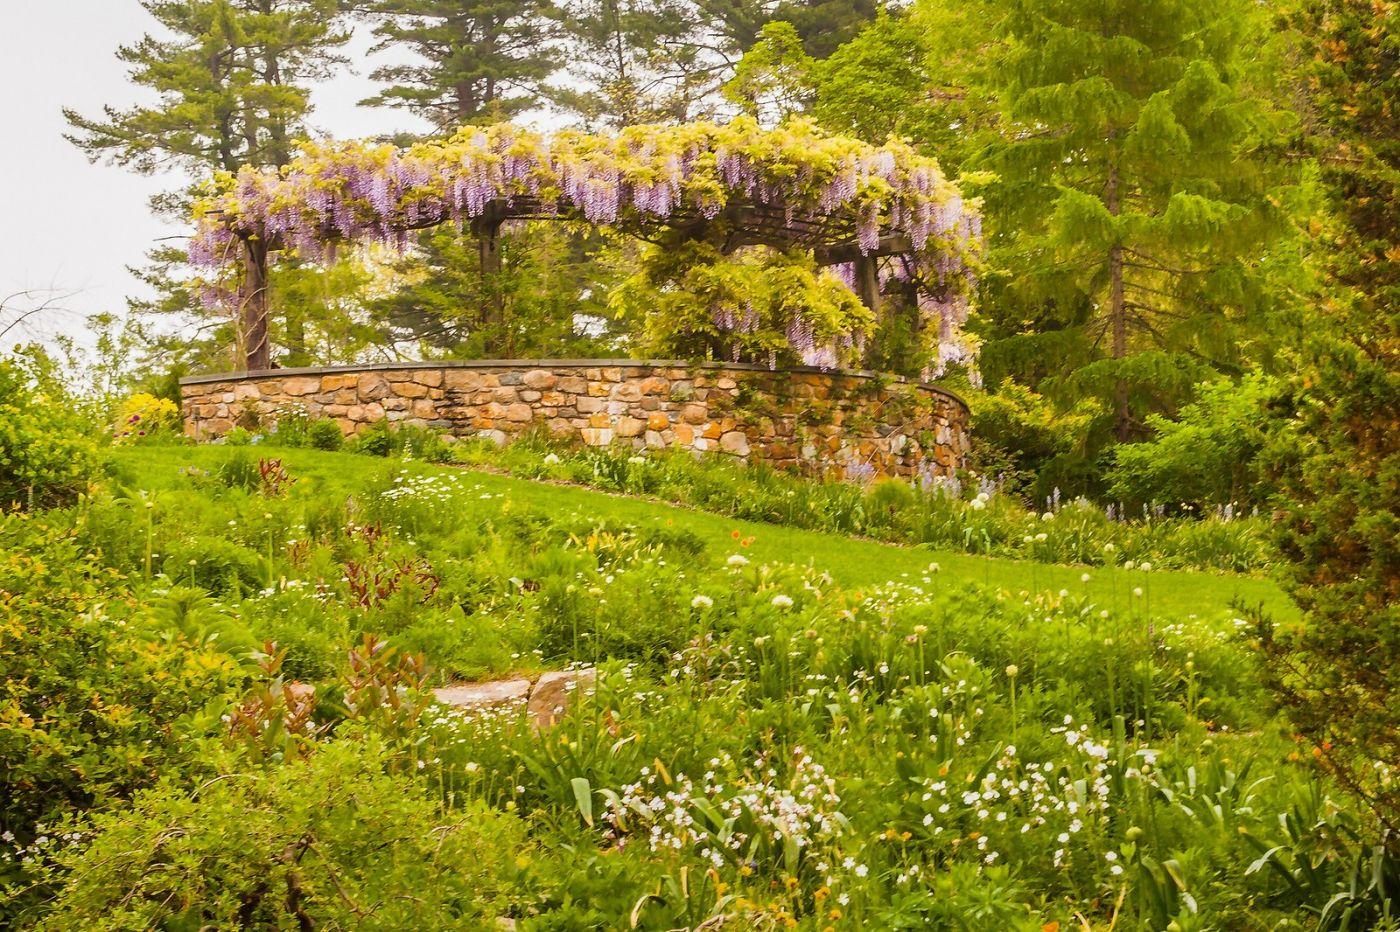 Chanticleer花园,那年盛开的紫藤花_图1-22